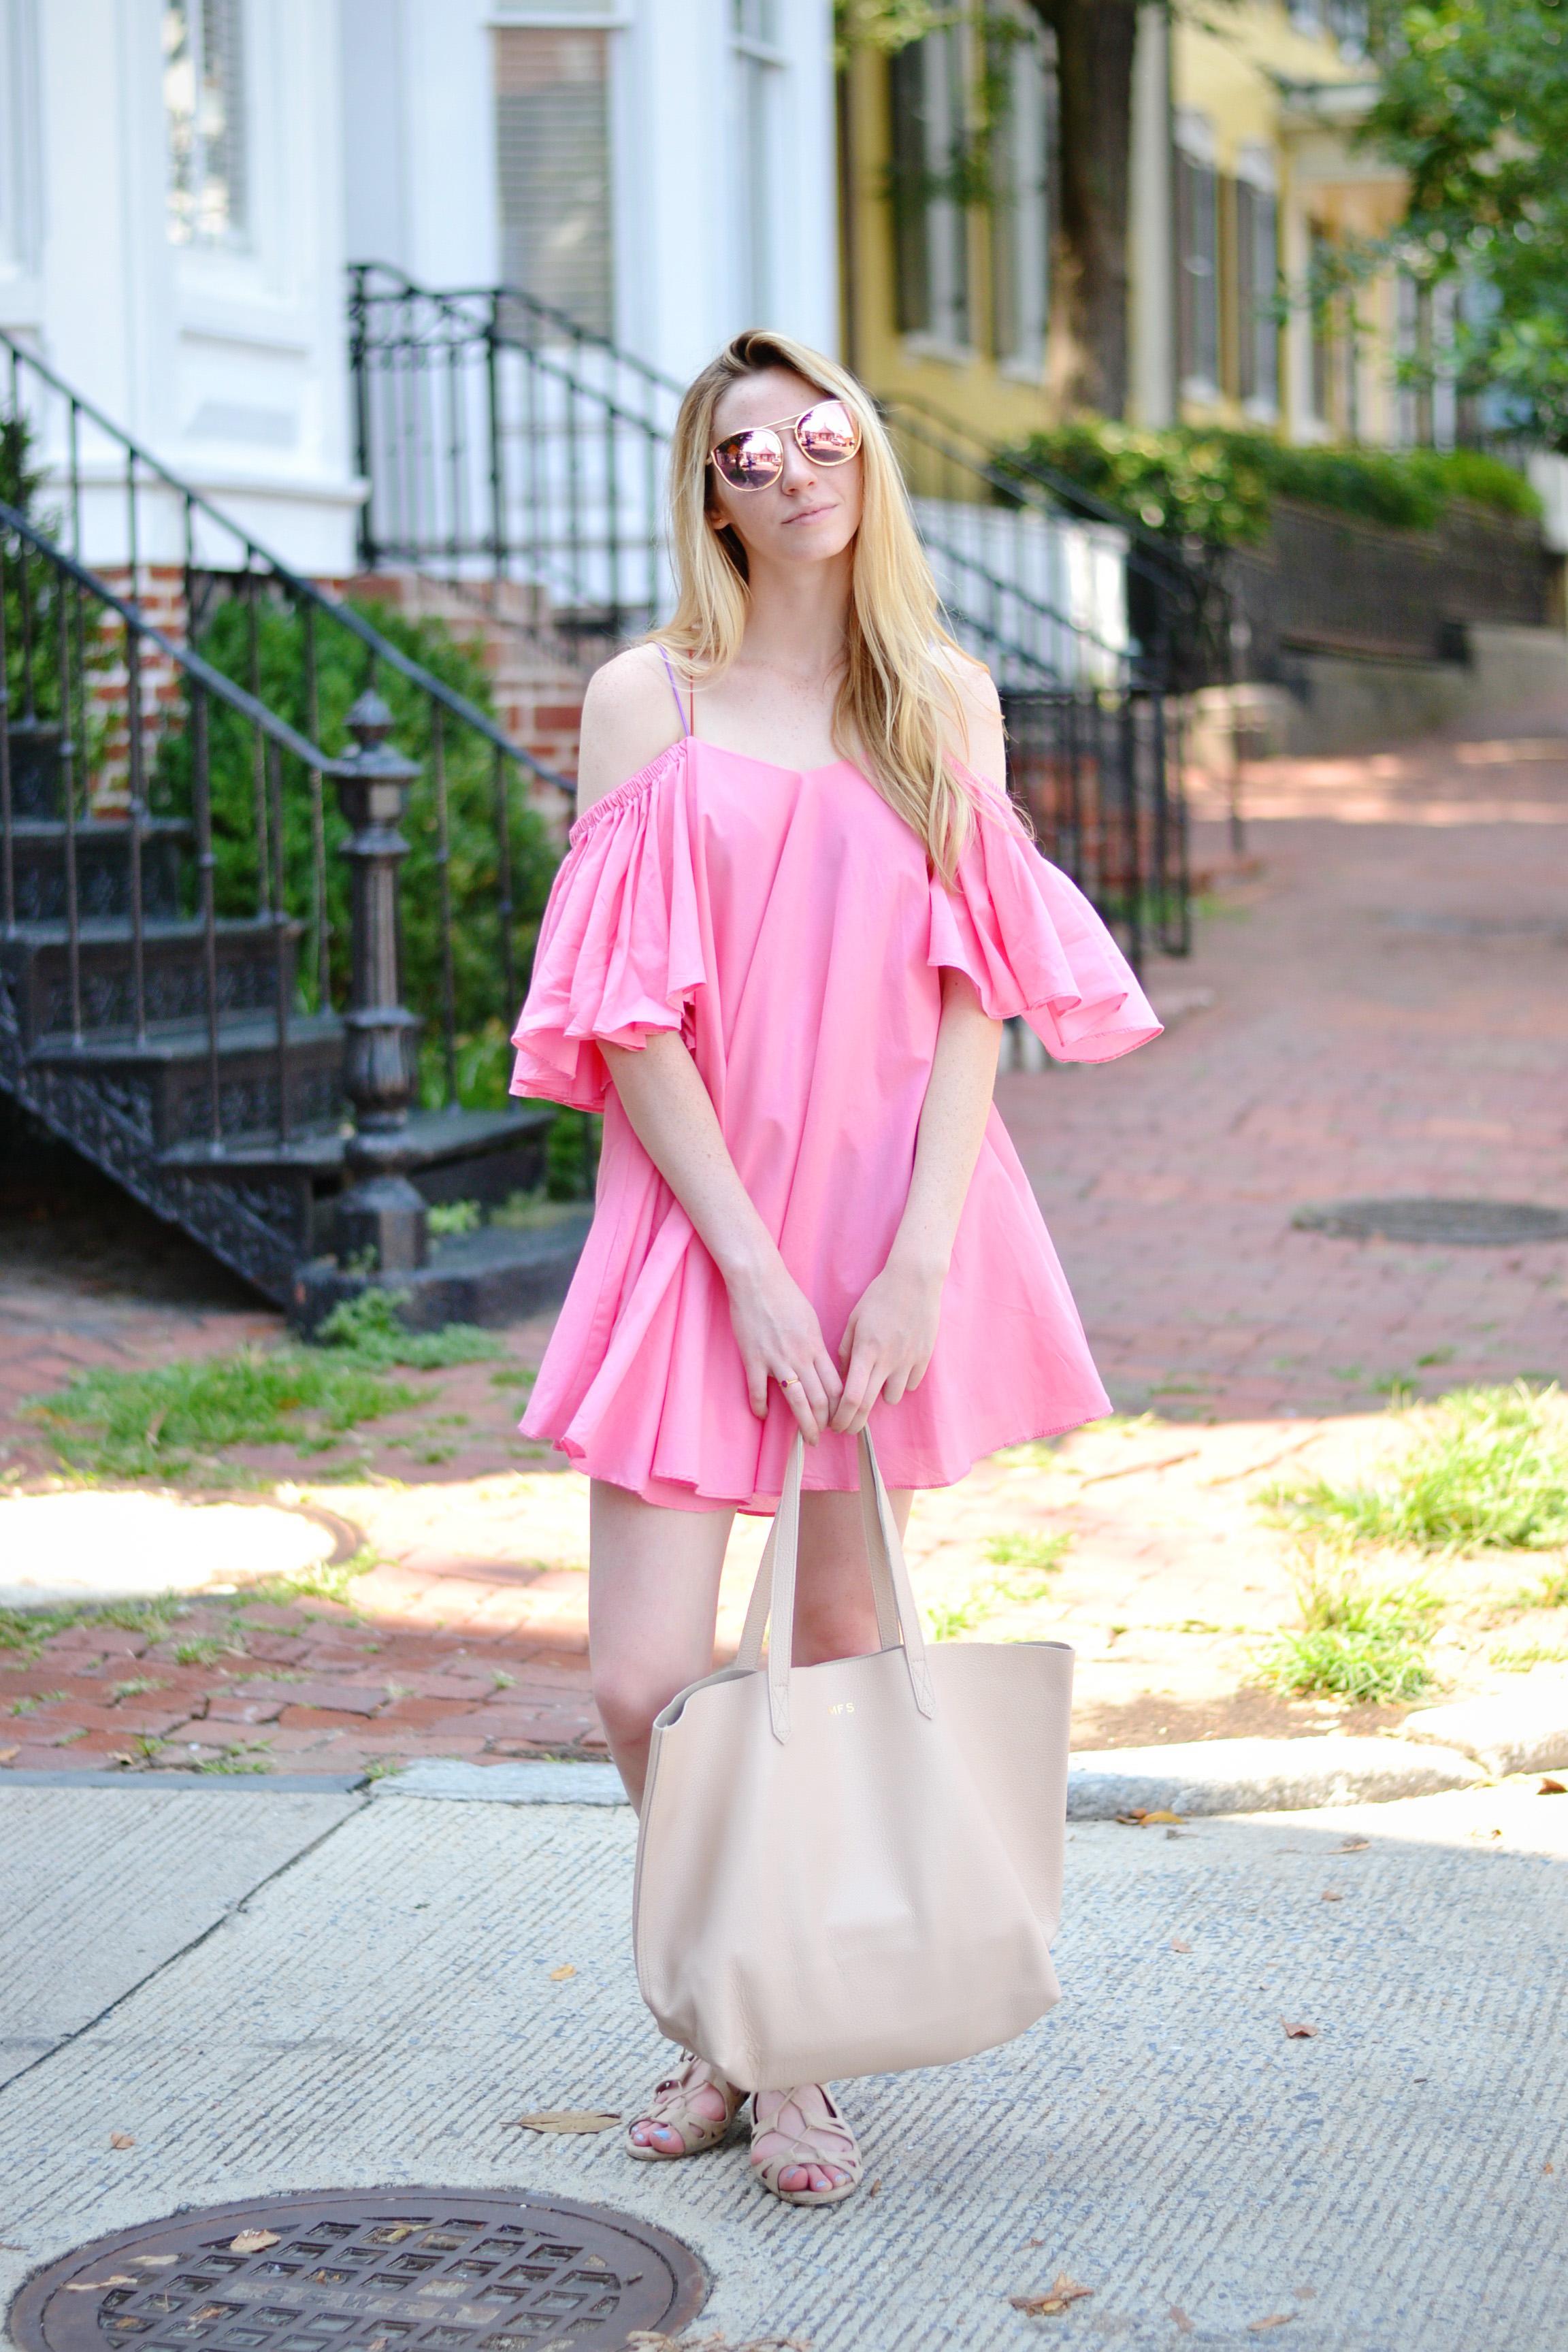 Voluminous Bright Pink Blogger Dress (via Chic Now)